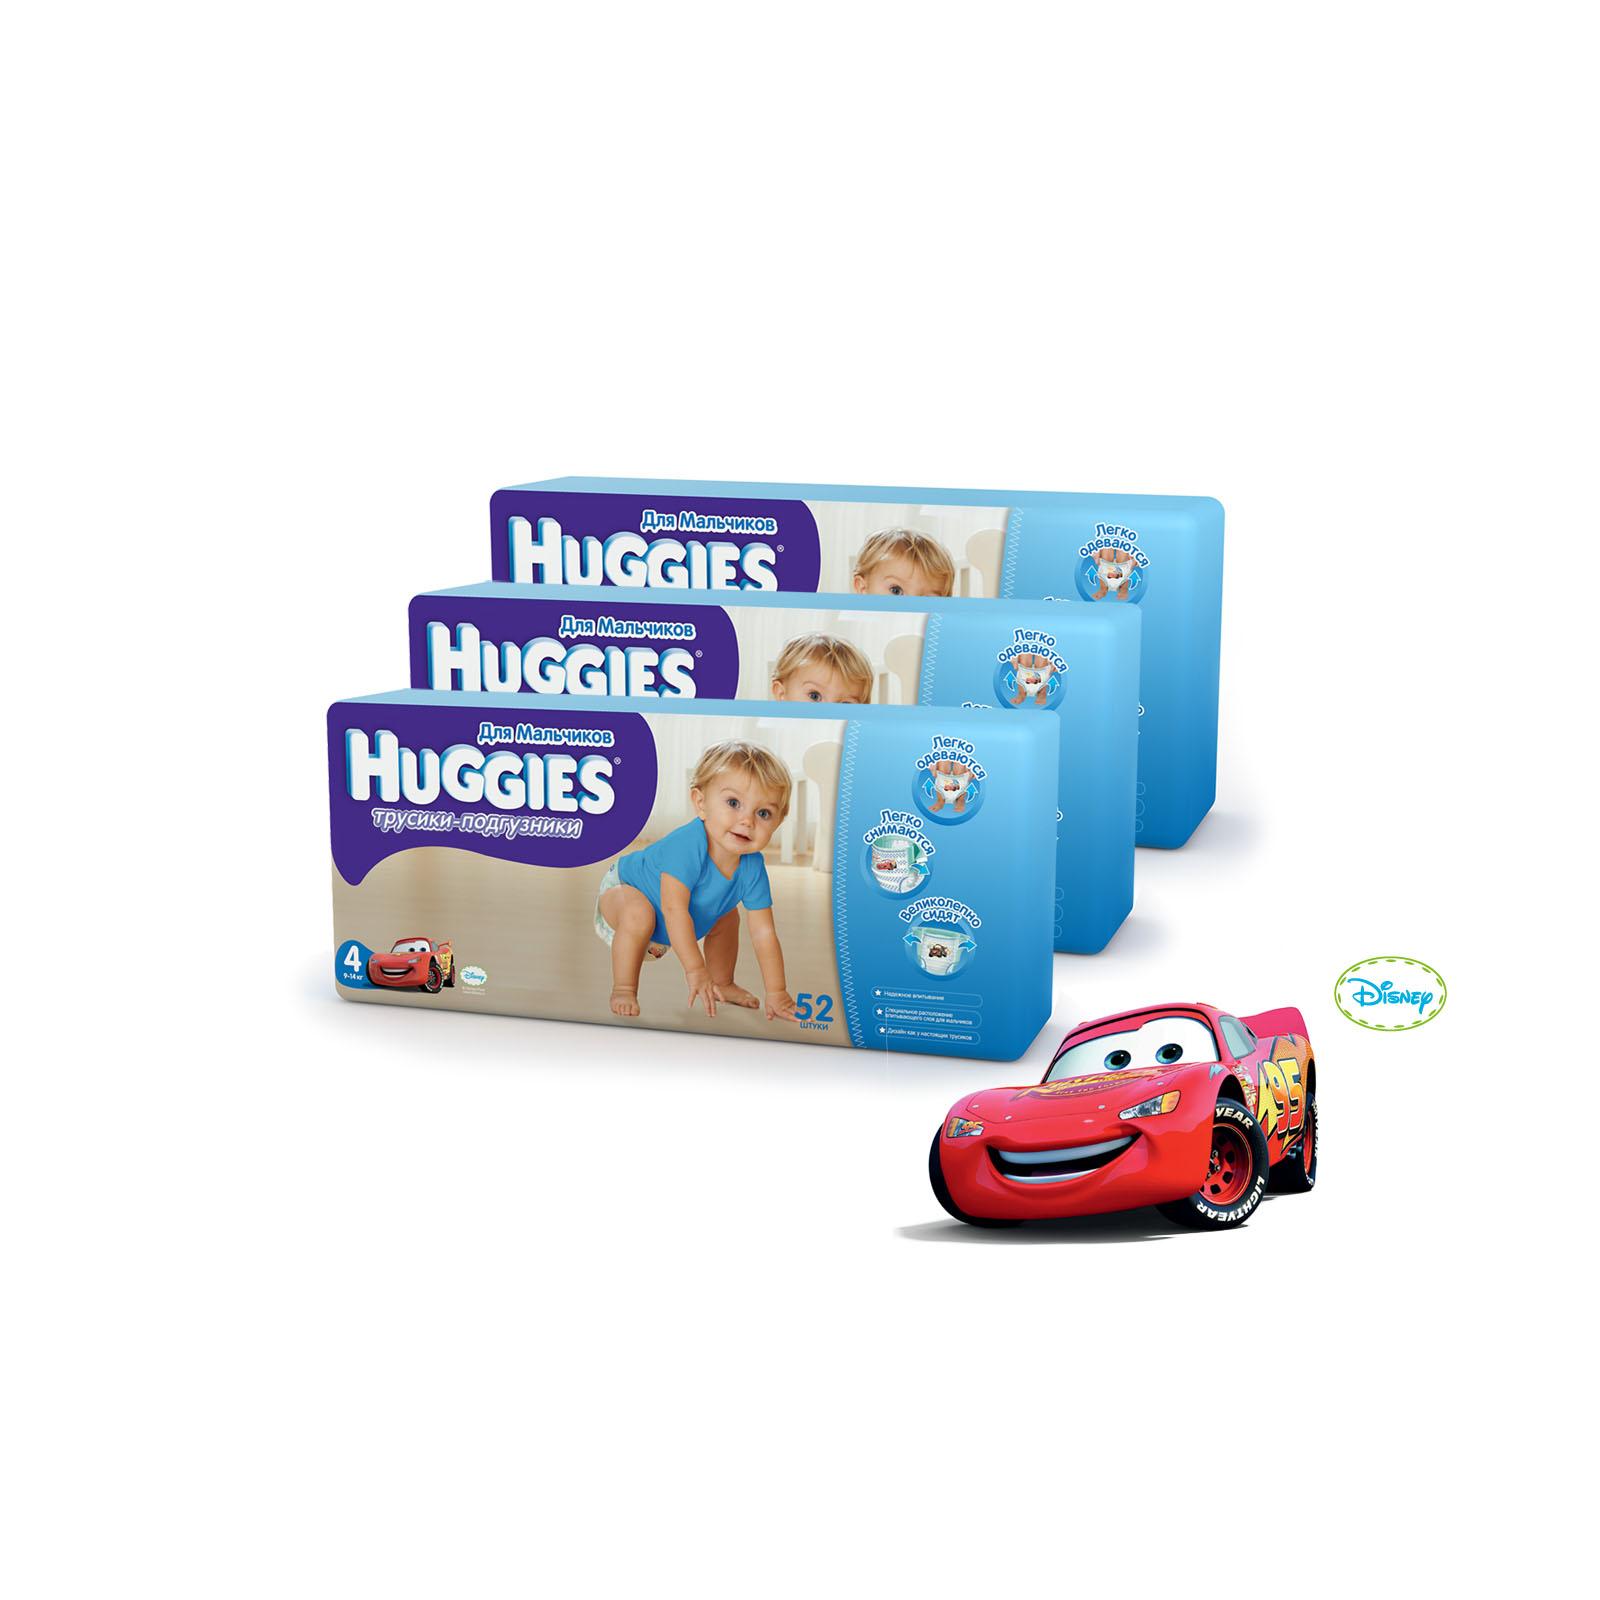 ����� �������� Huggies � 3 ��� ���������� ������ ������ 4